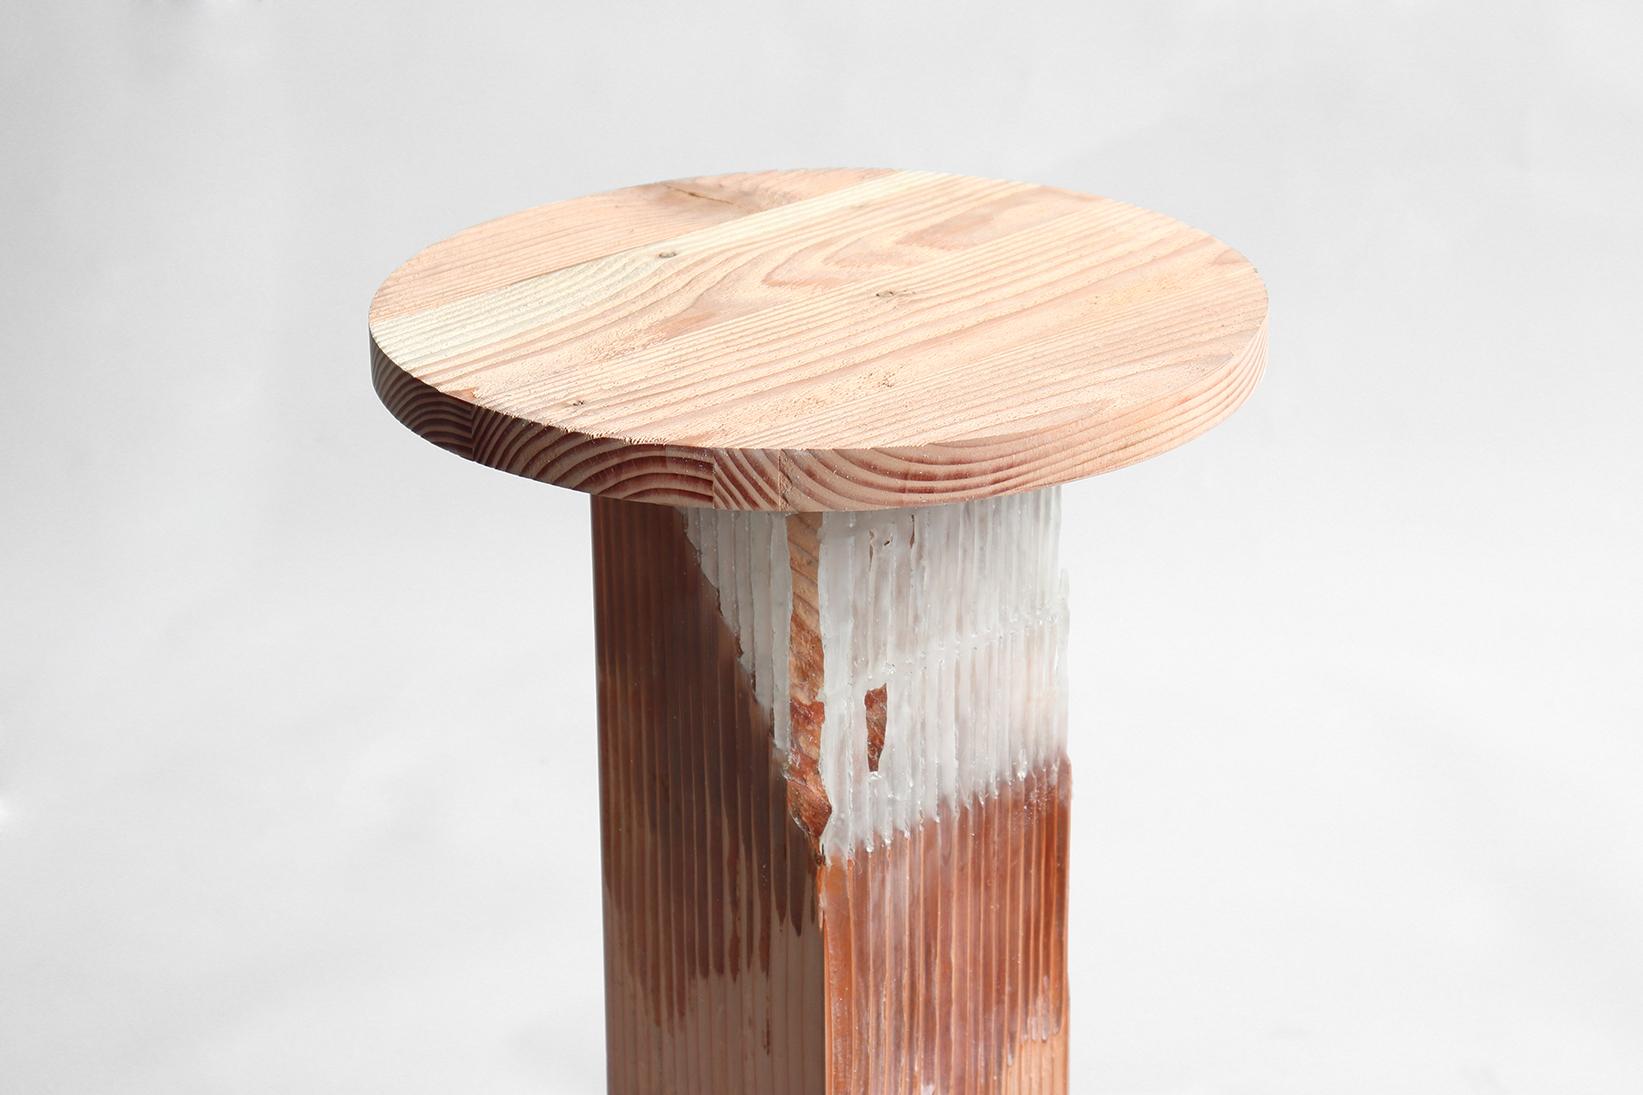 Groovy Grain Table Sho Ota Machost Co Dining Chair Design Ideas Machostcouk